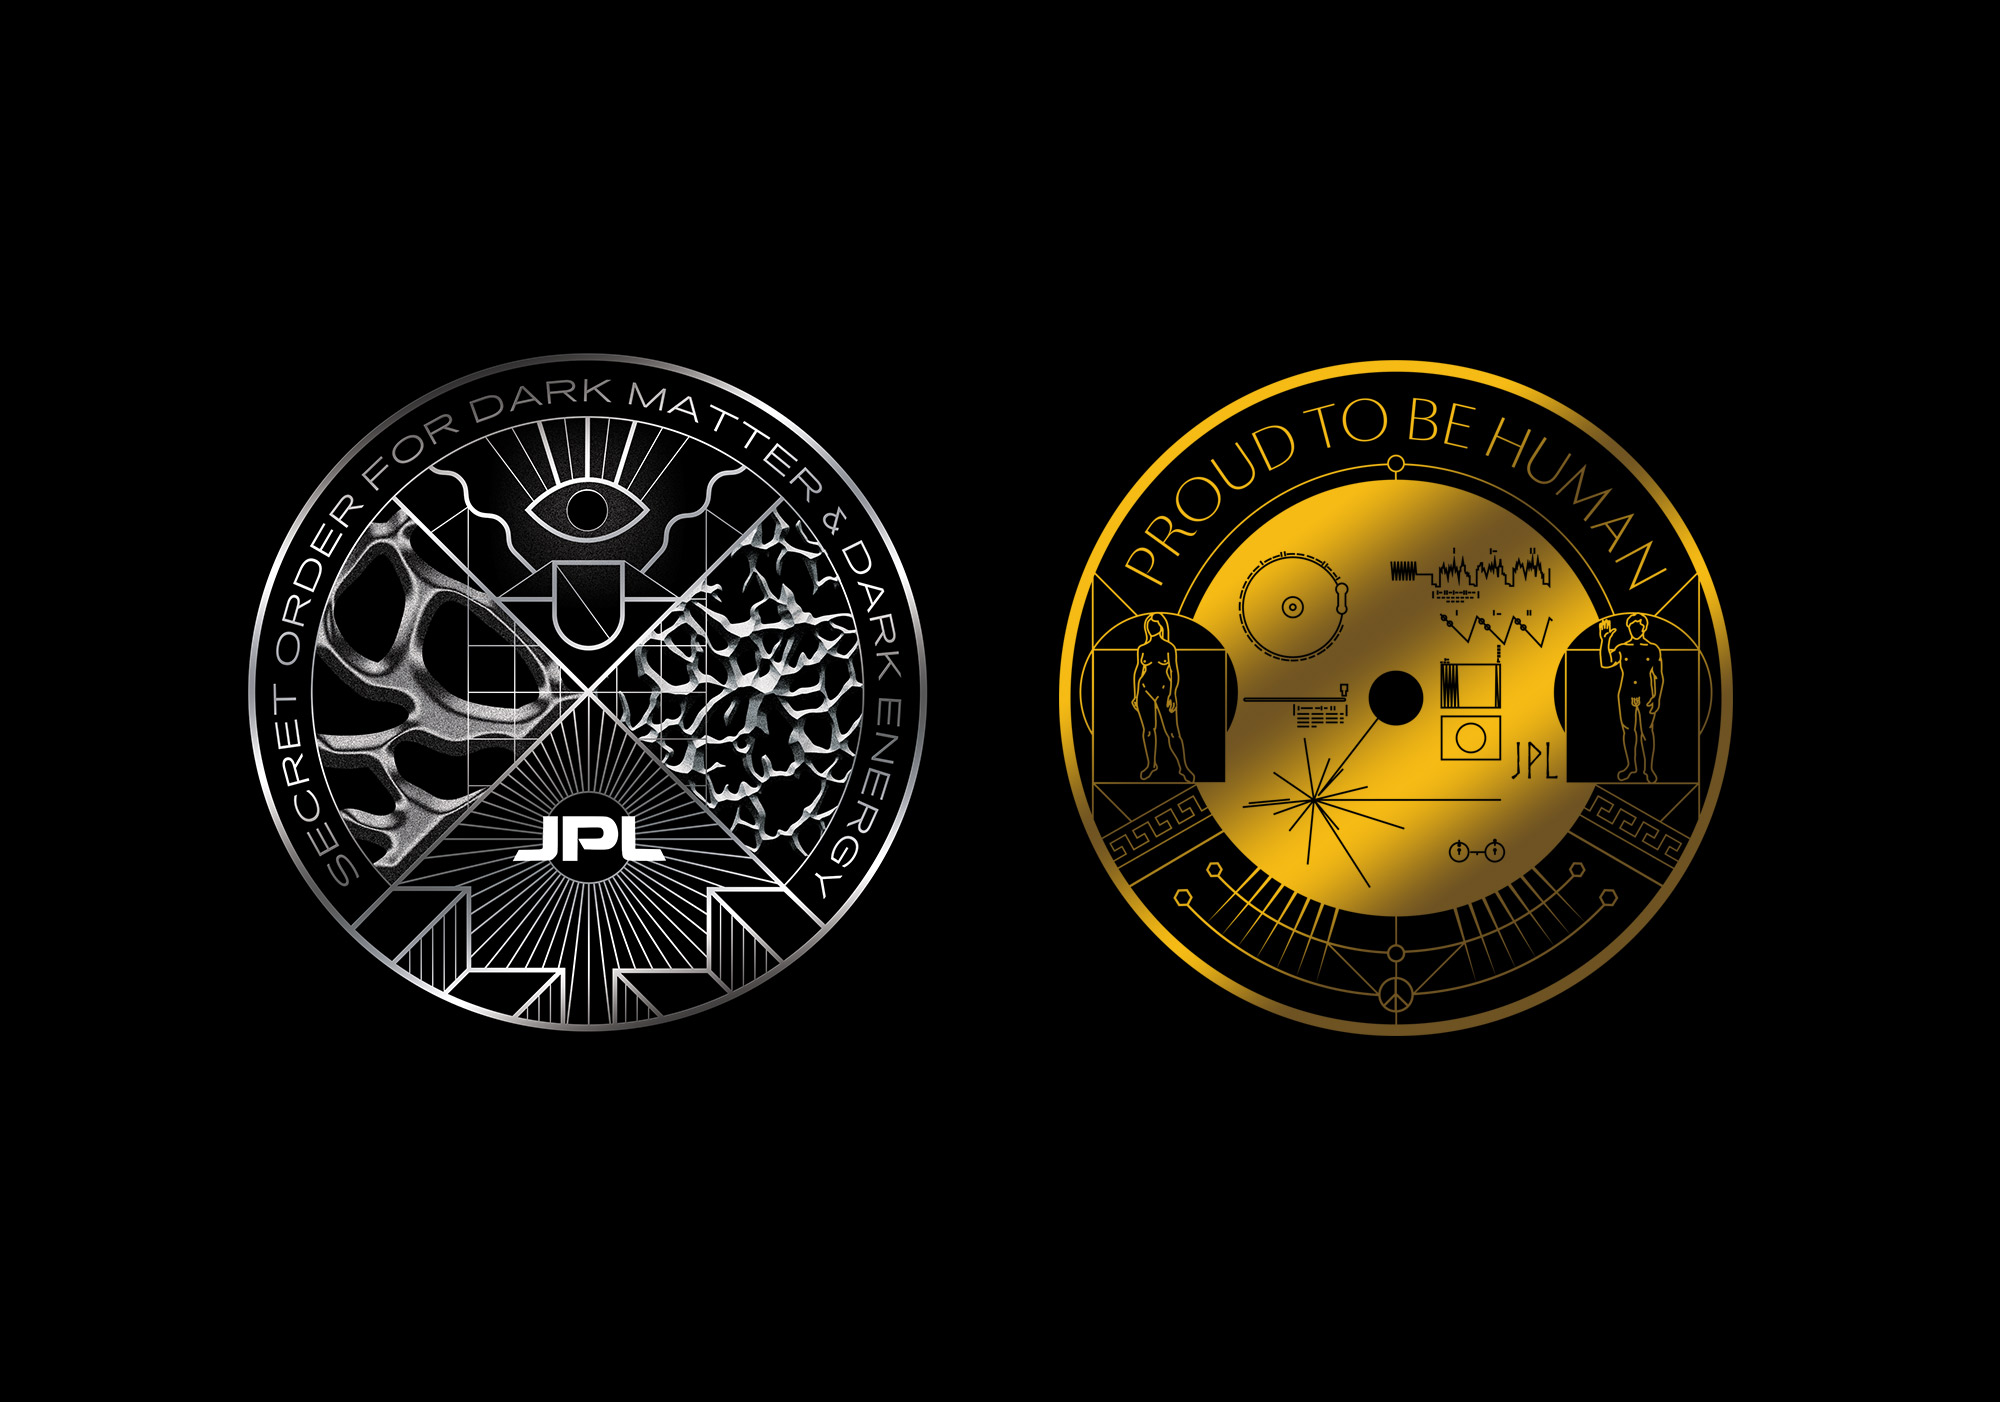 JPL_4